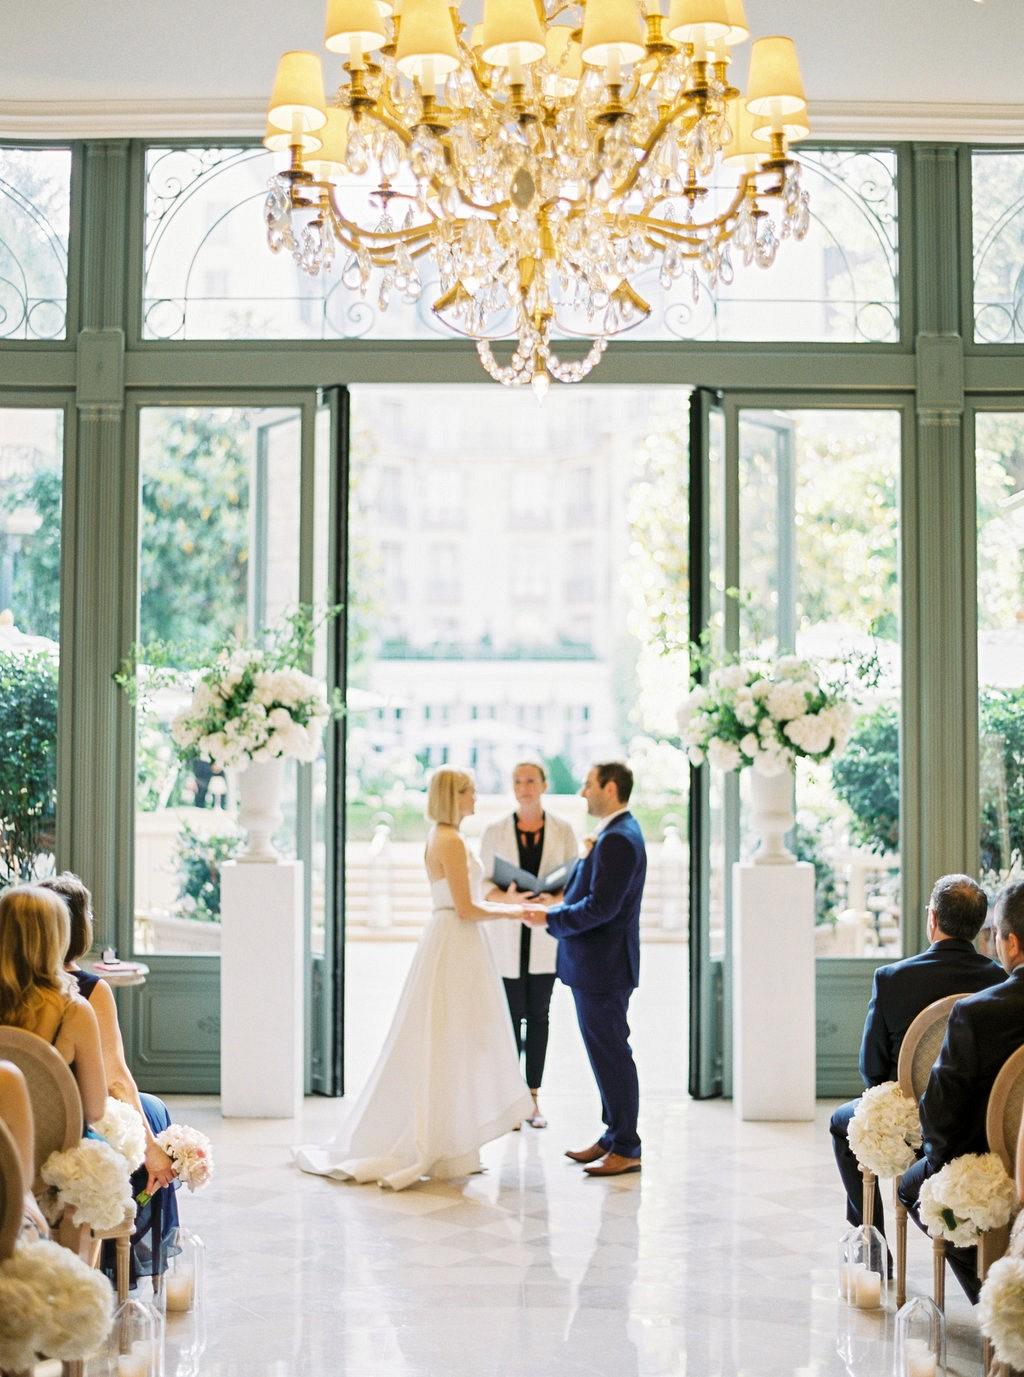 Alex and David's Romantic Destination wedding at the Ritz Paris